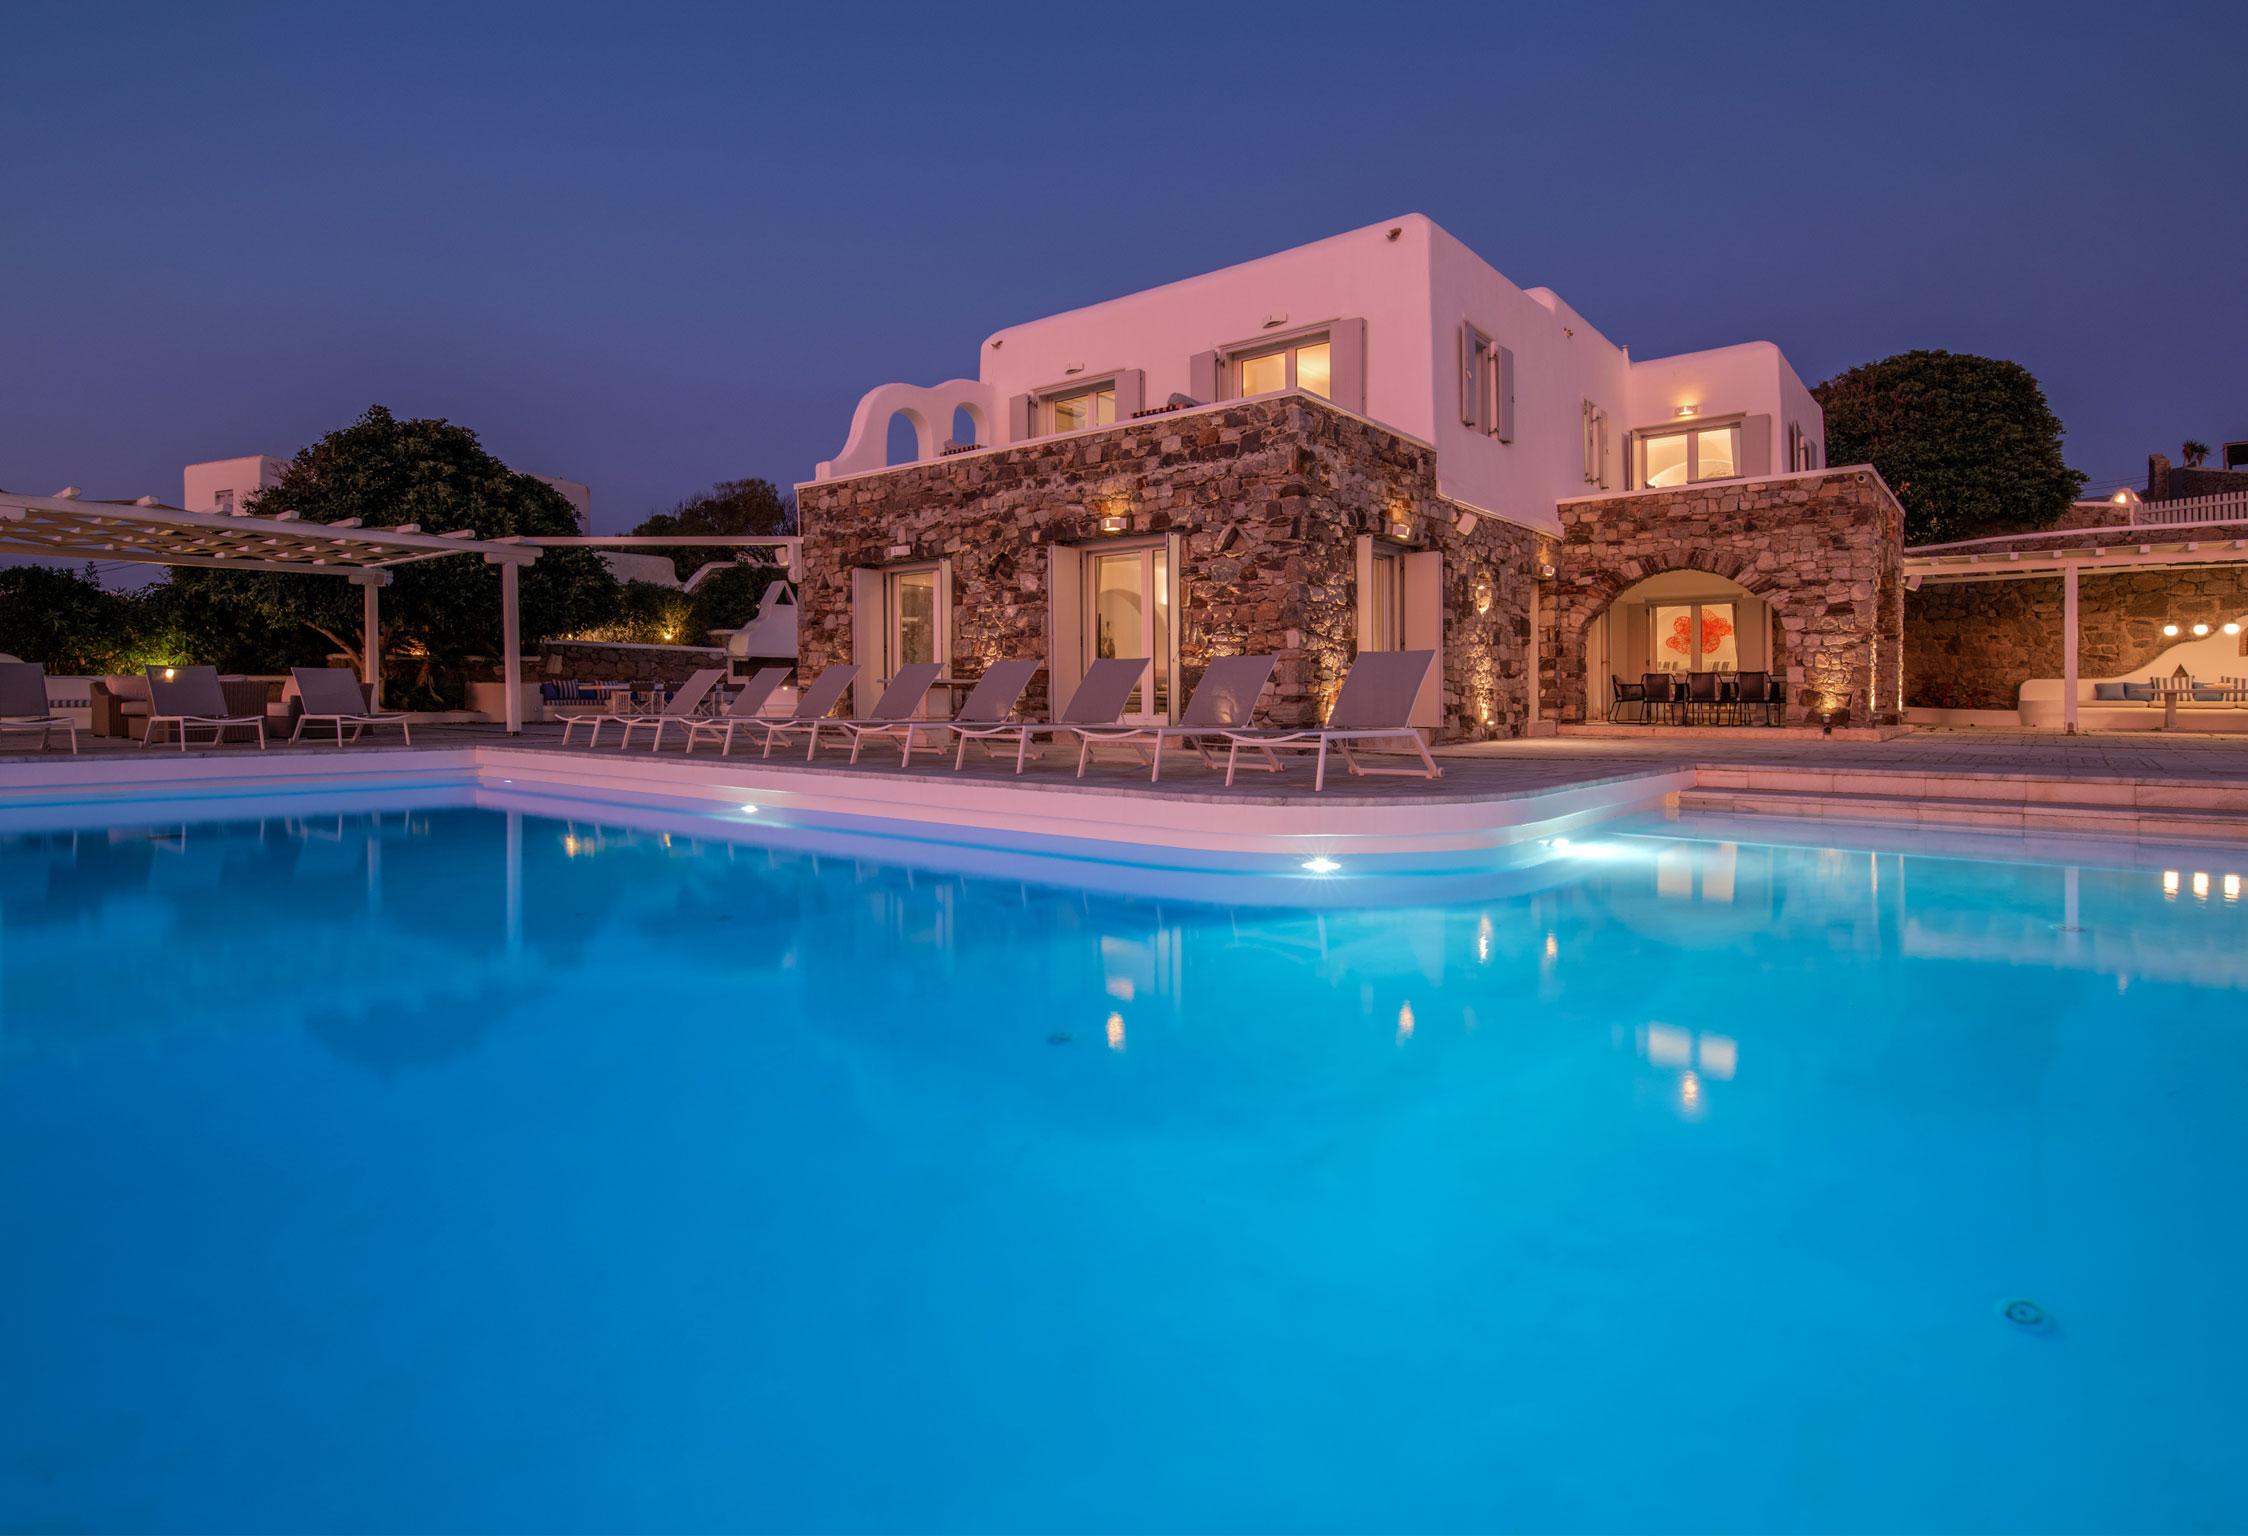 Mykonos Villa Eumelia jumbotron image